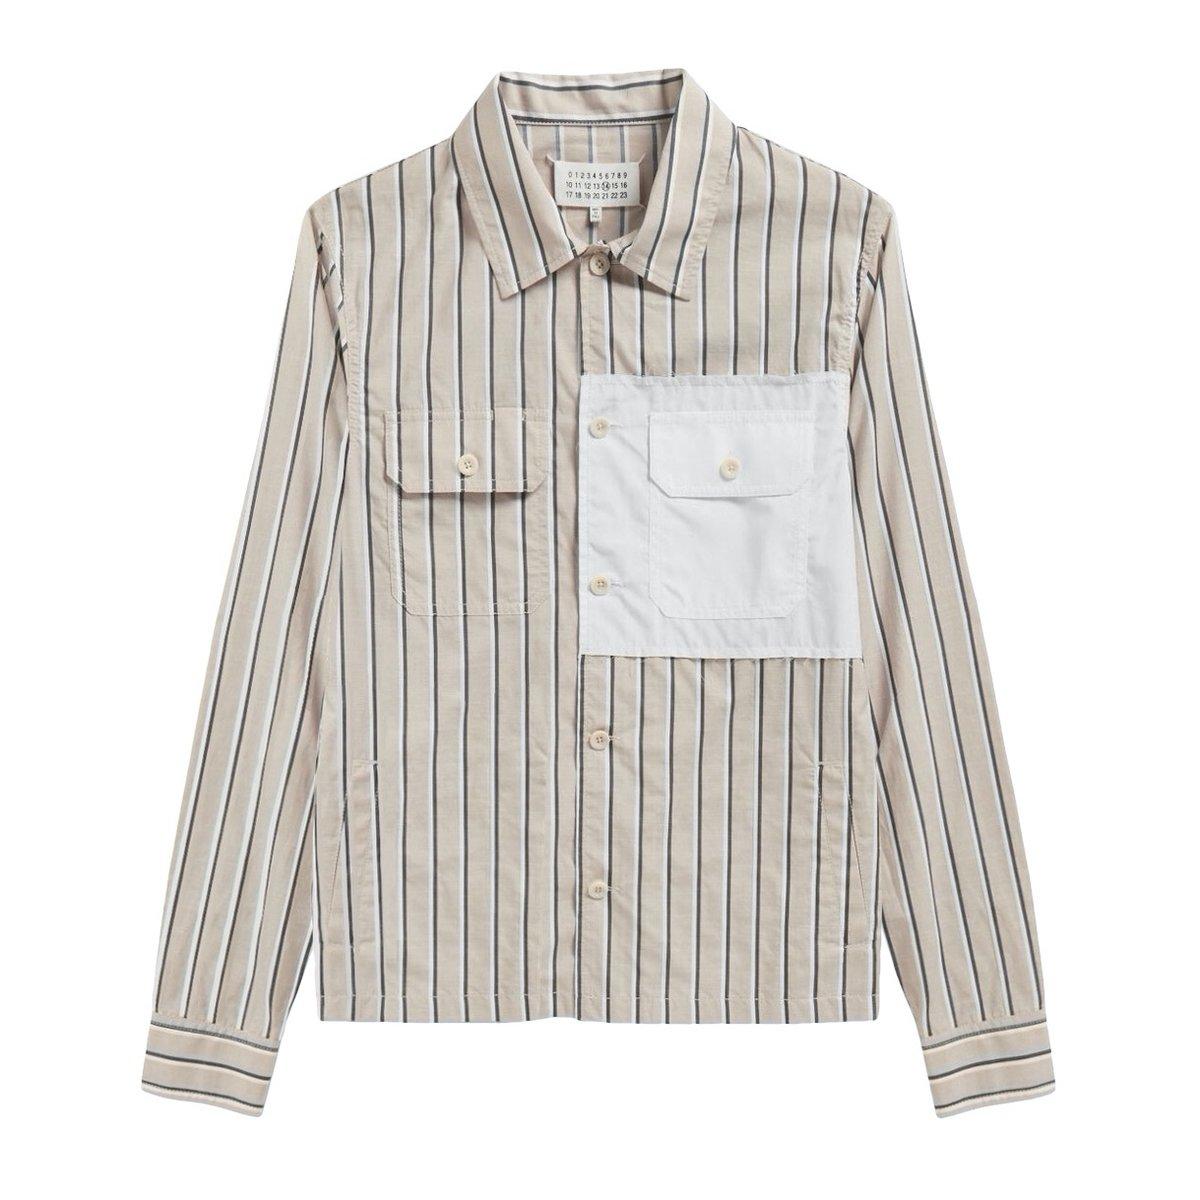 Maison Margiela Patch Striped Overshirt.jpg